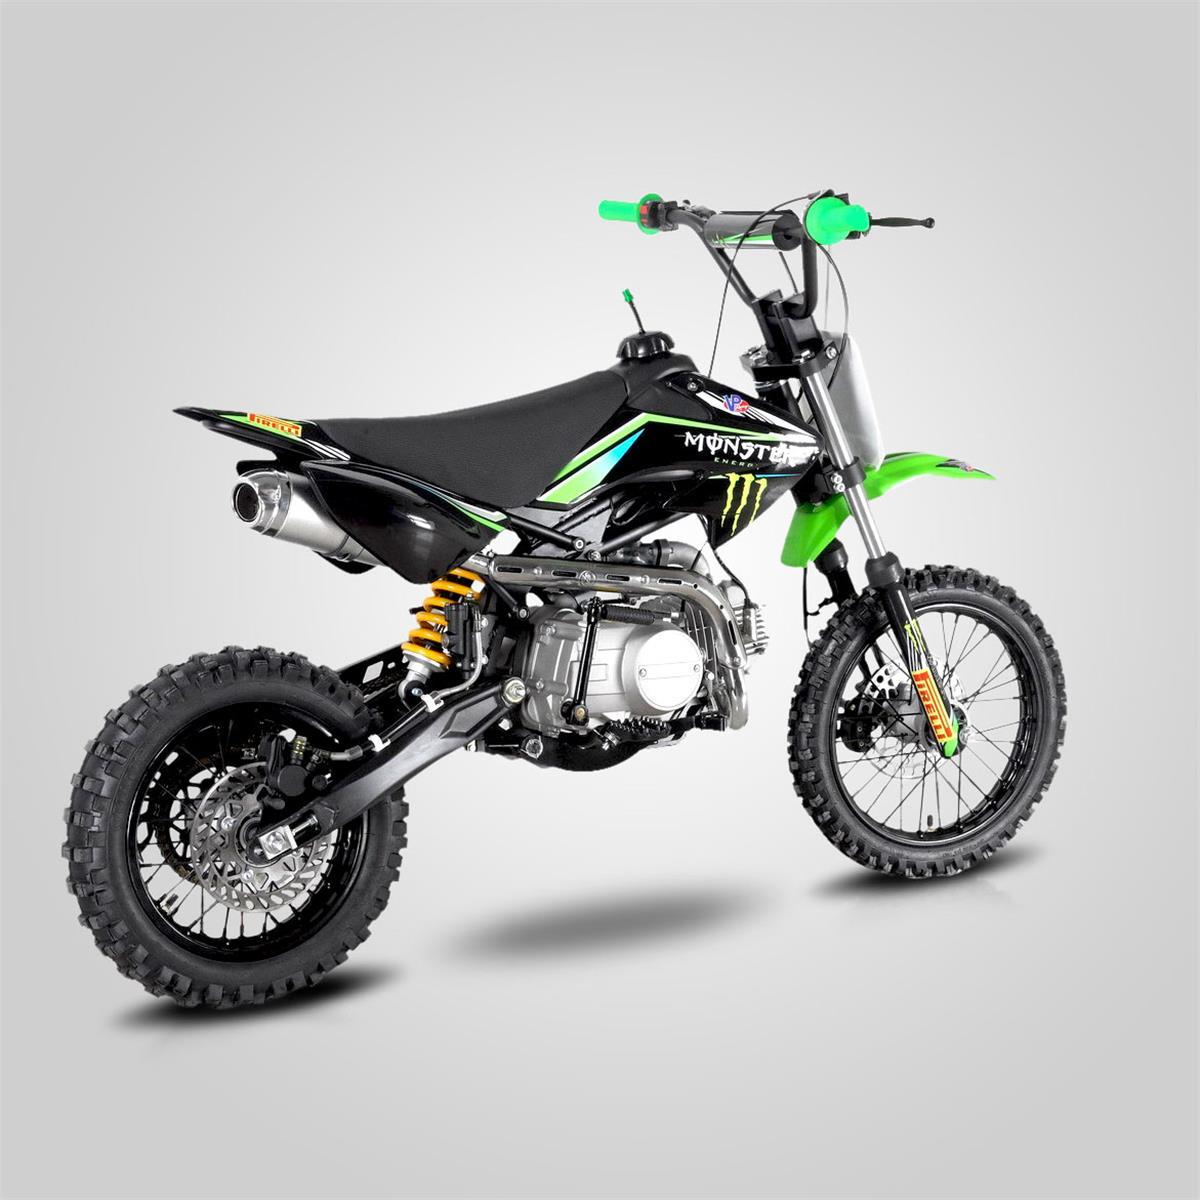 pit bike smx mx 125 monster 125cc smallmx dirt bike pit bike quads minimoto. Black Bedroom Furniture Sets. Home Design Ideas